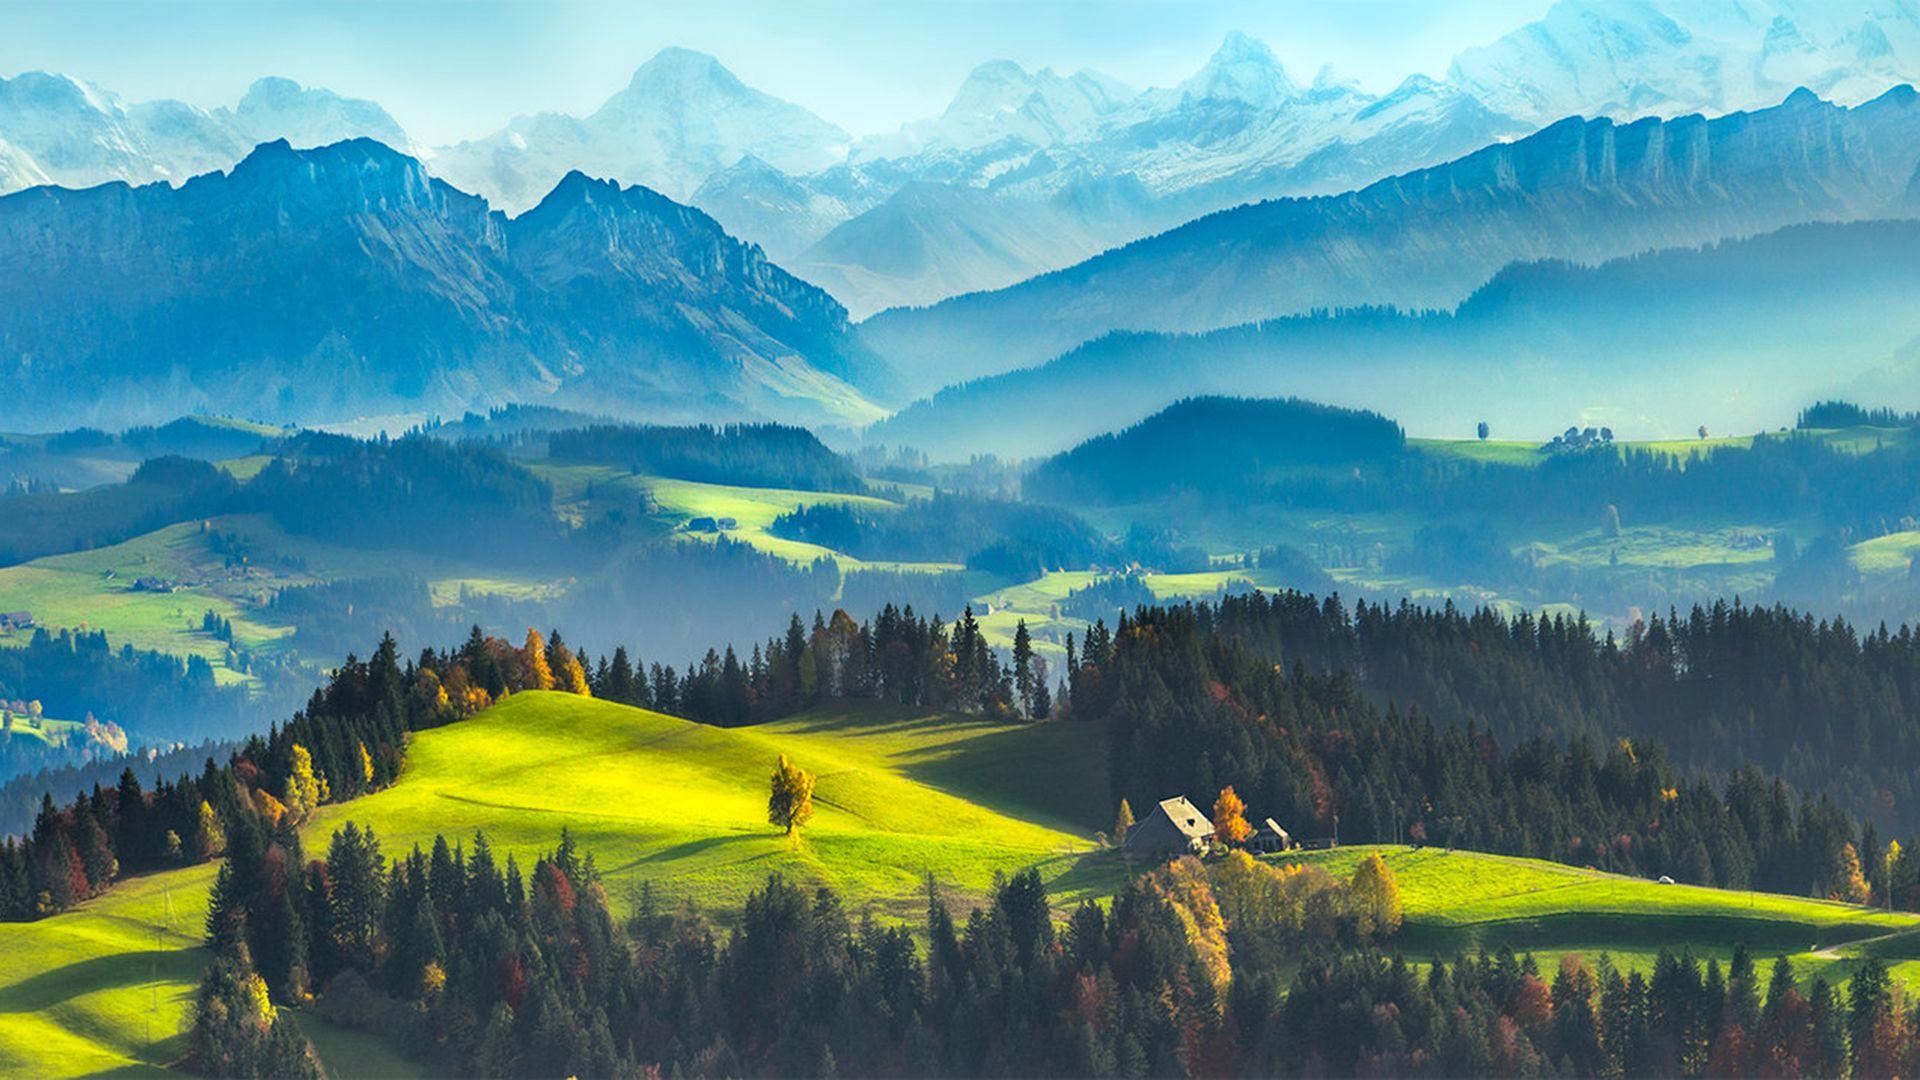 Desktop Wallpapers Beautiful Mountains